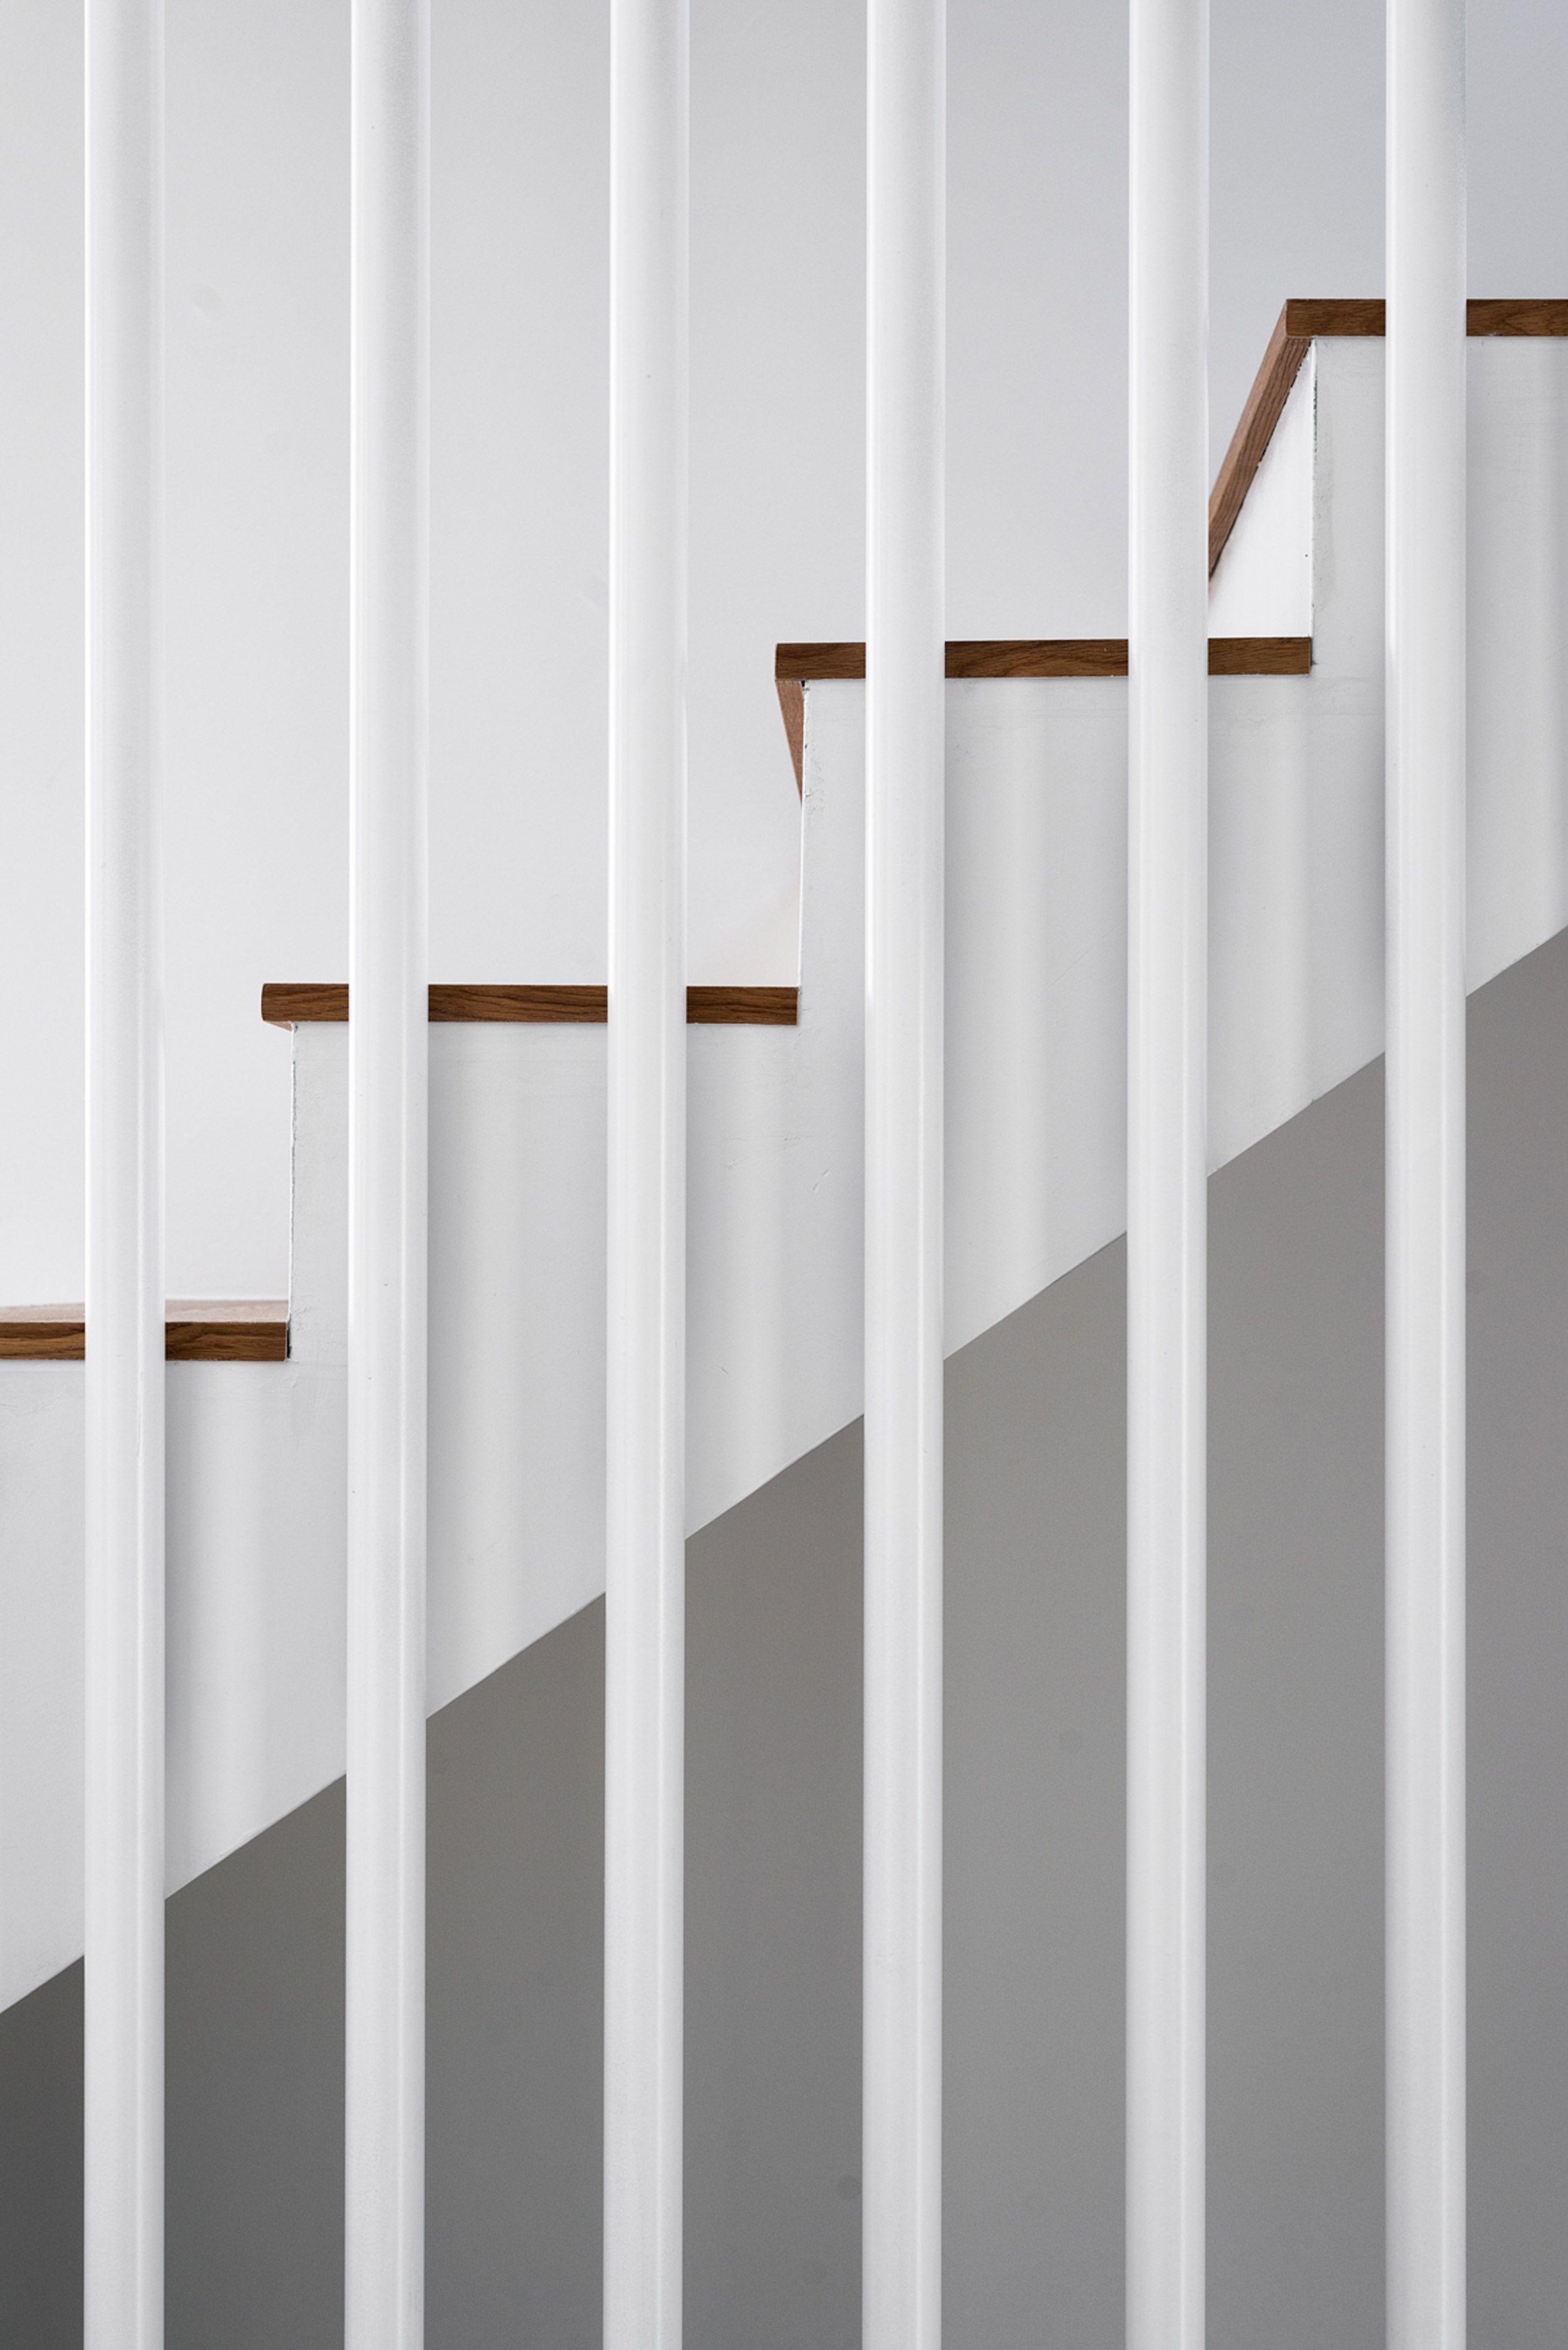 //.dezeen.com/2018/03/14/stocker-lee-architetti-architecture-house -apartments-eiger-monch-junfrau-rancate-switzerland-alps/?utm_medium\u003d ... & https://www.dezeen.com/2018/03/14/stocker-lee-architetti ...